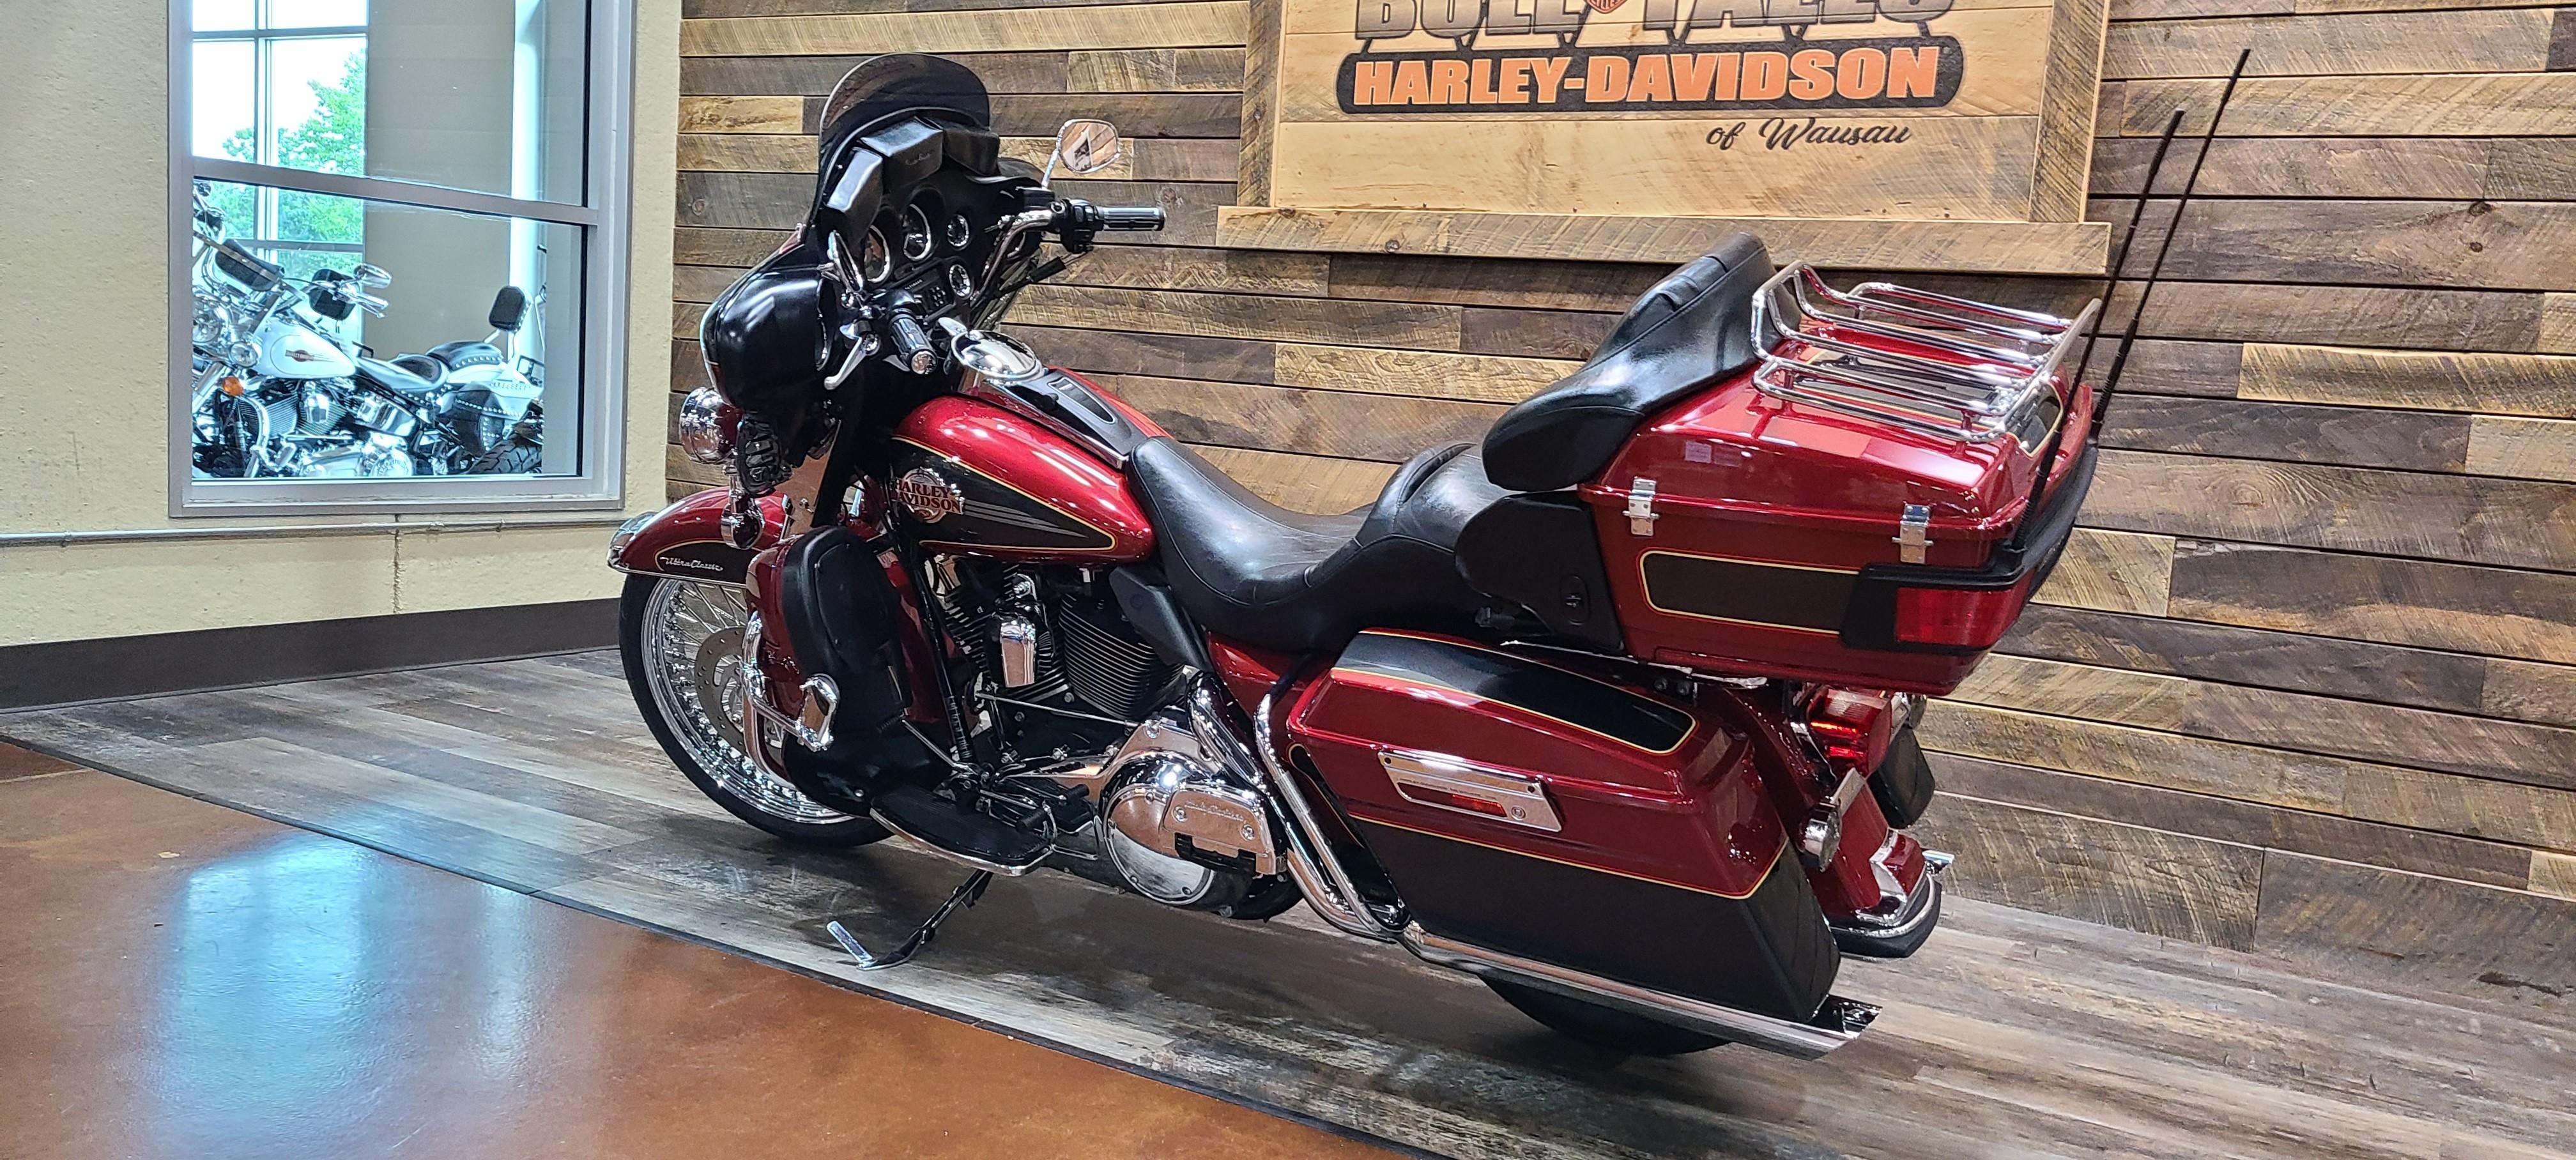 2007 Harley-Davidson Electra Glide Ultra Classic at Bull Falls Harley-Davidson